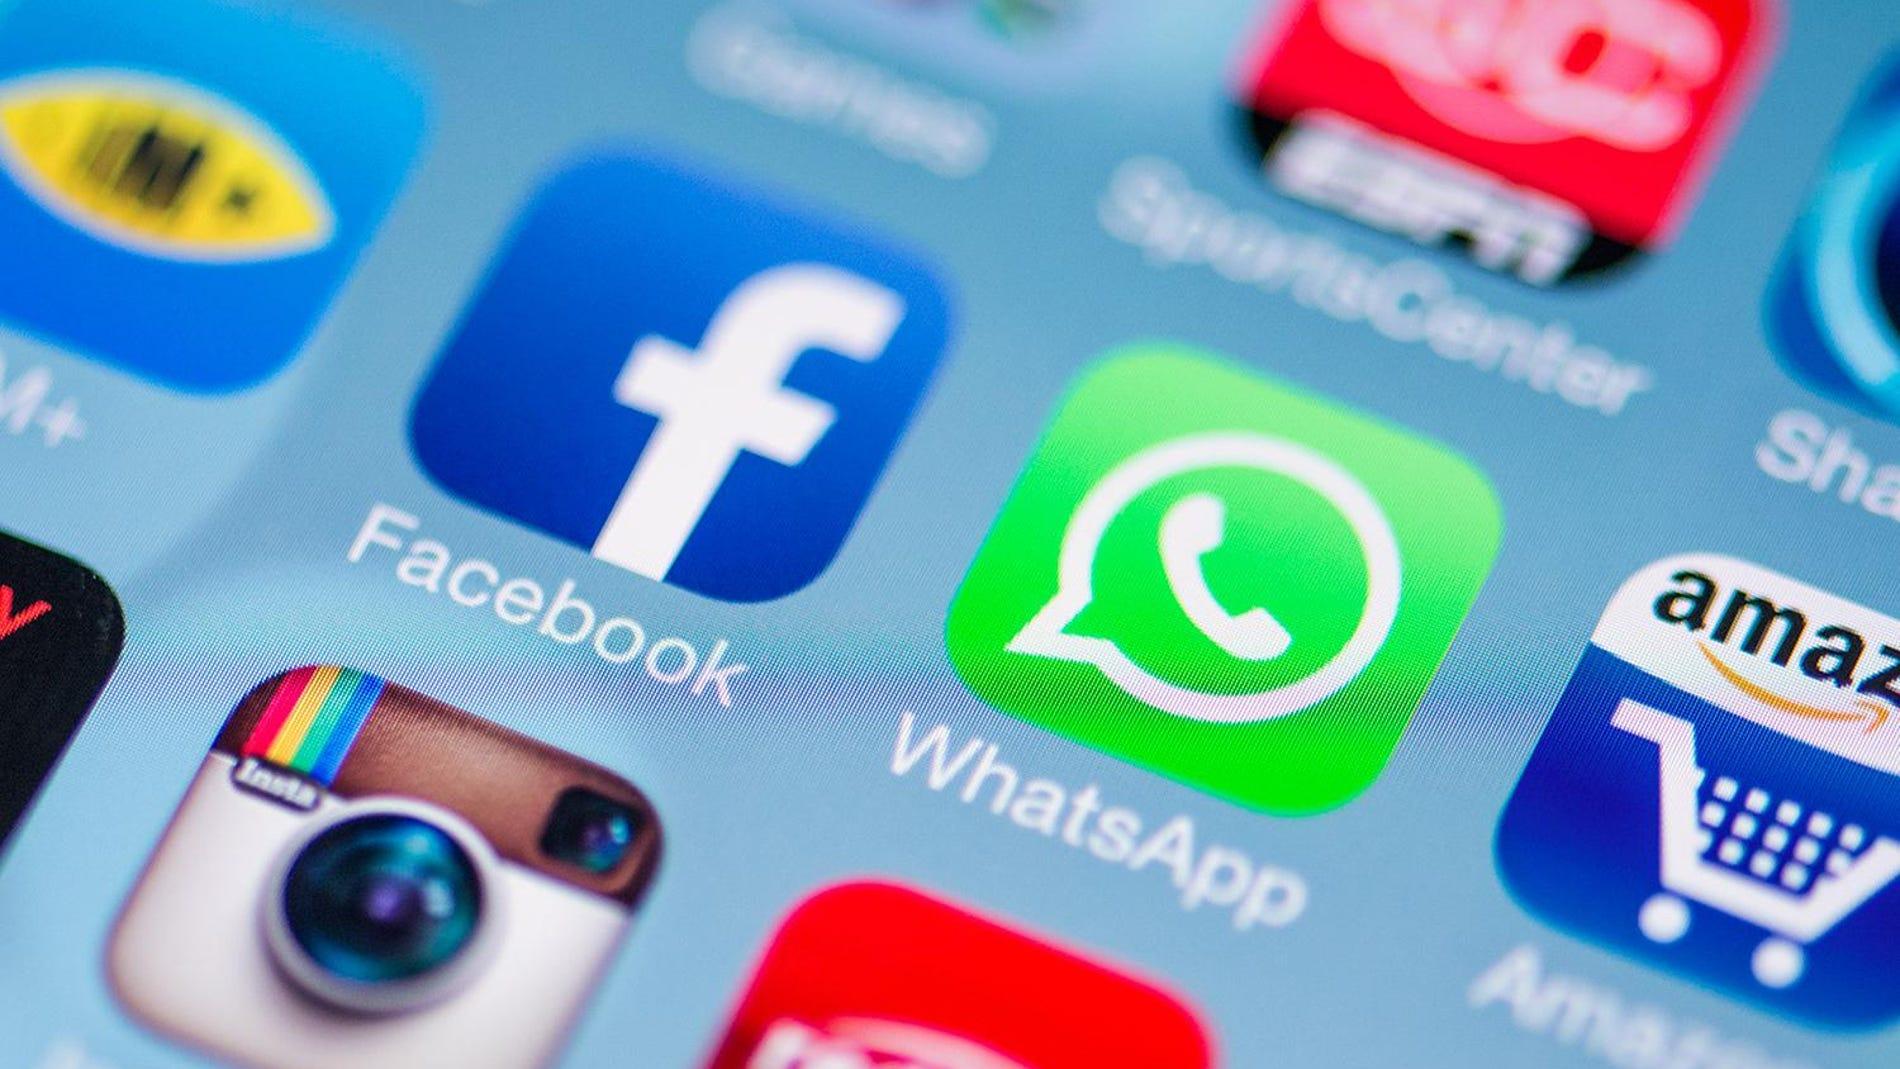 Comprar WhatsApp le salió a Facebook por una pasta gansa